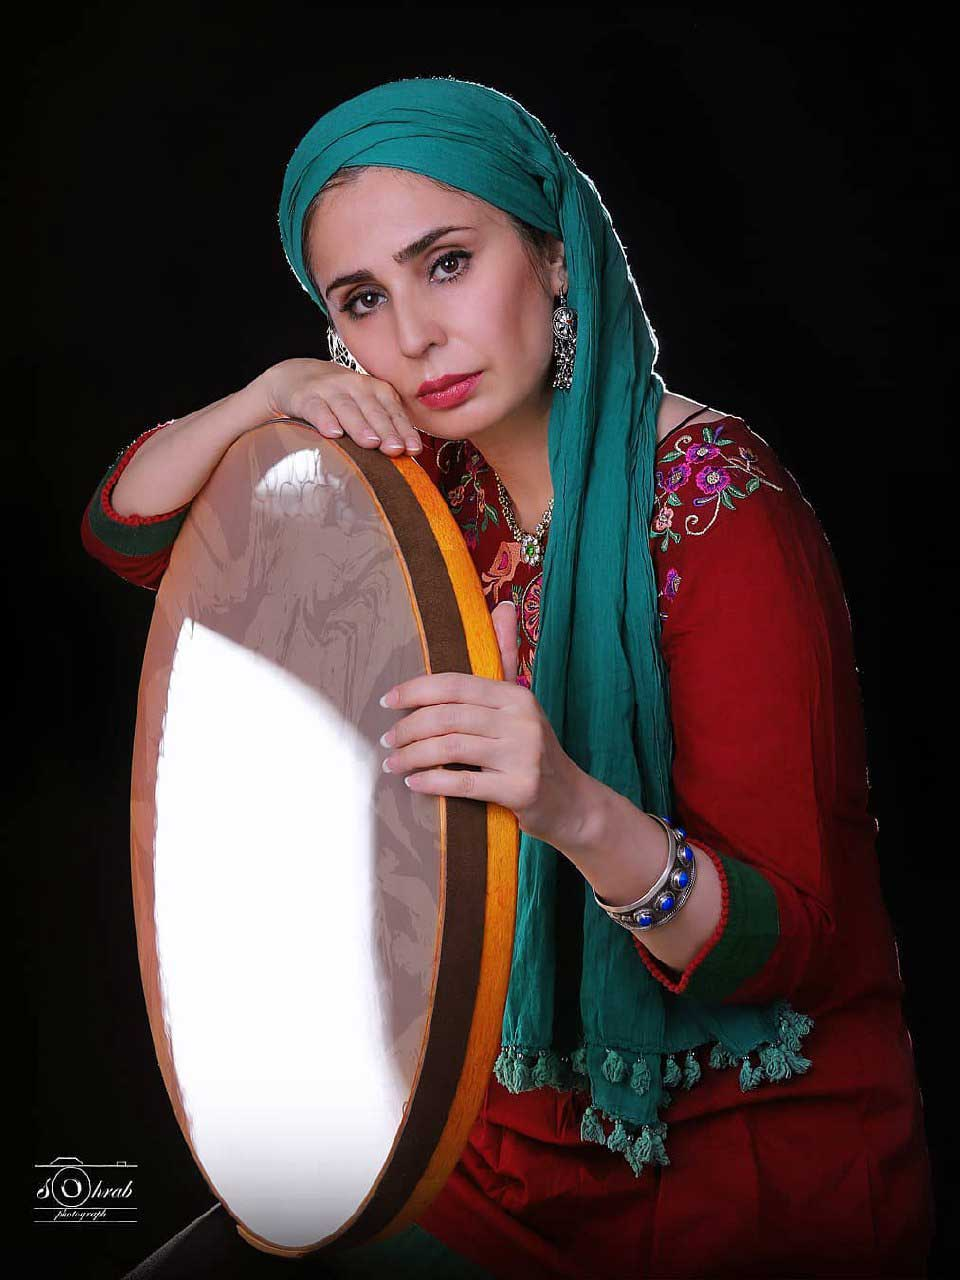 عکس هنری نورپردازی تک نور توسط مهندس سهراب نعیمی